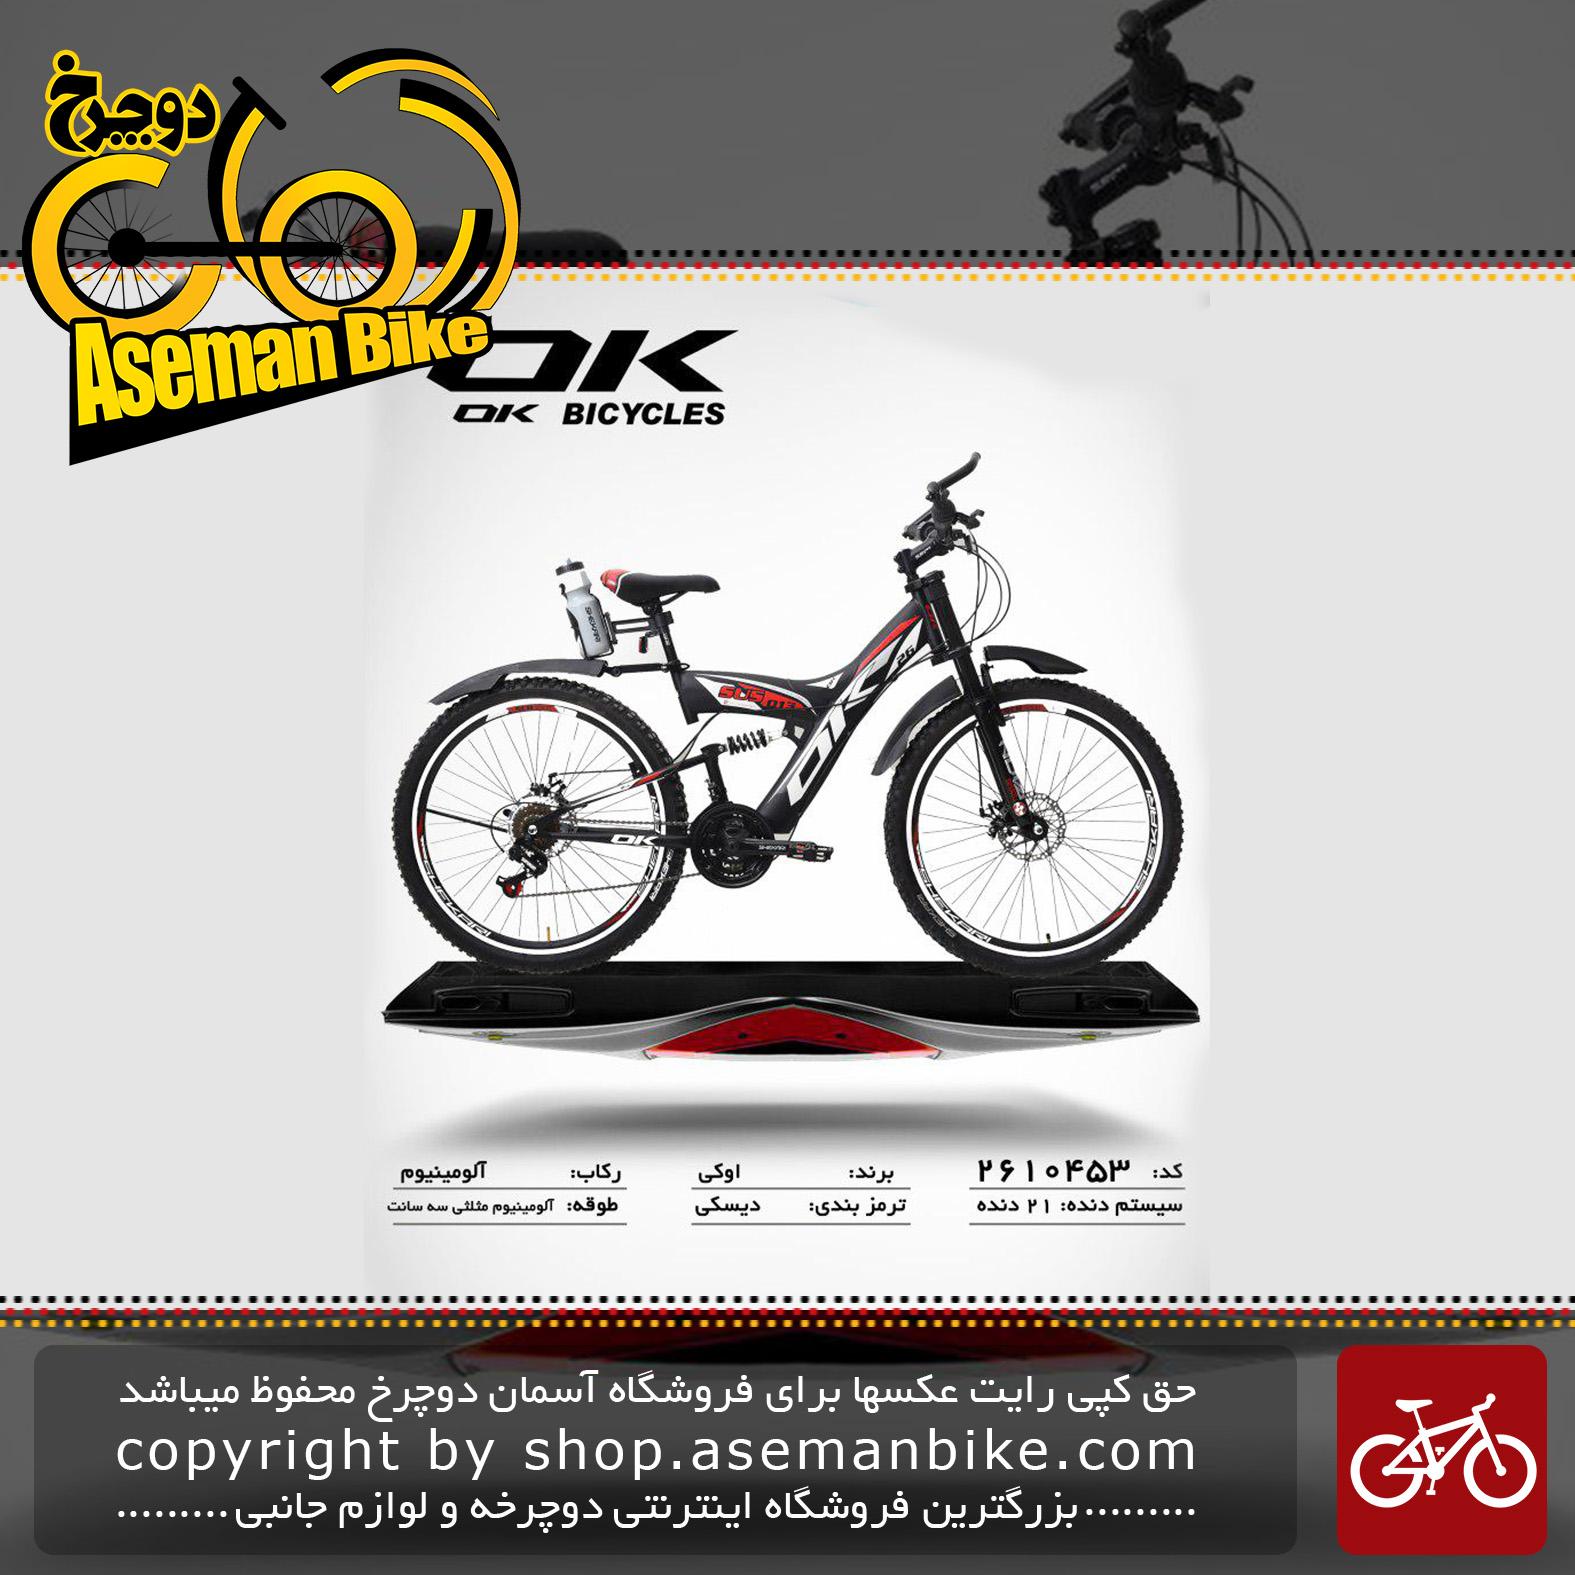 دوچرخه کوهستان شهری اوکی دو کمک مدل 453 21 دنده سایز 26 ساخت تایوان OK Mountain City Bicycle Taiwan 453 Size 26 21 Speed 2019